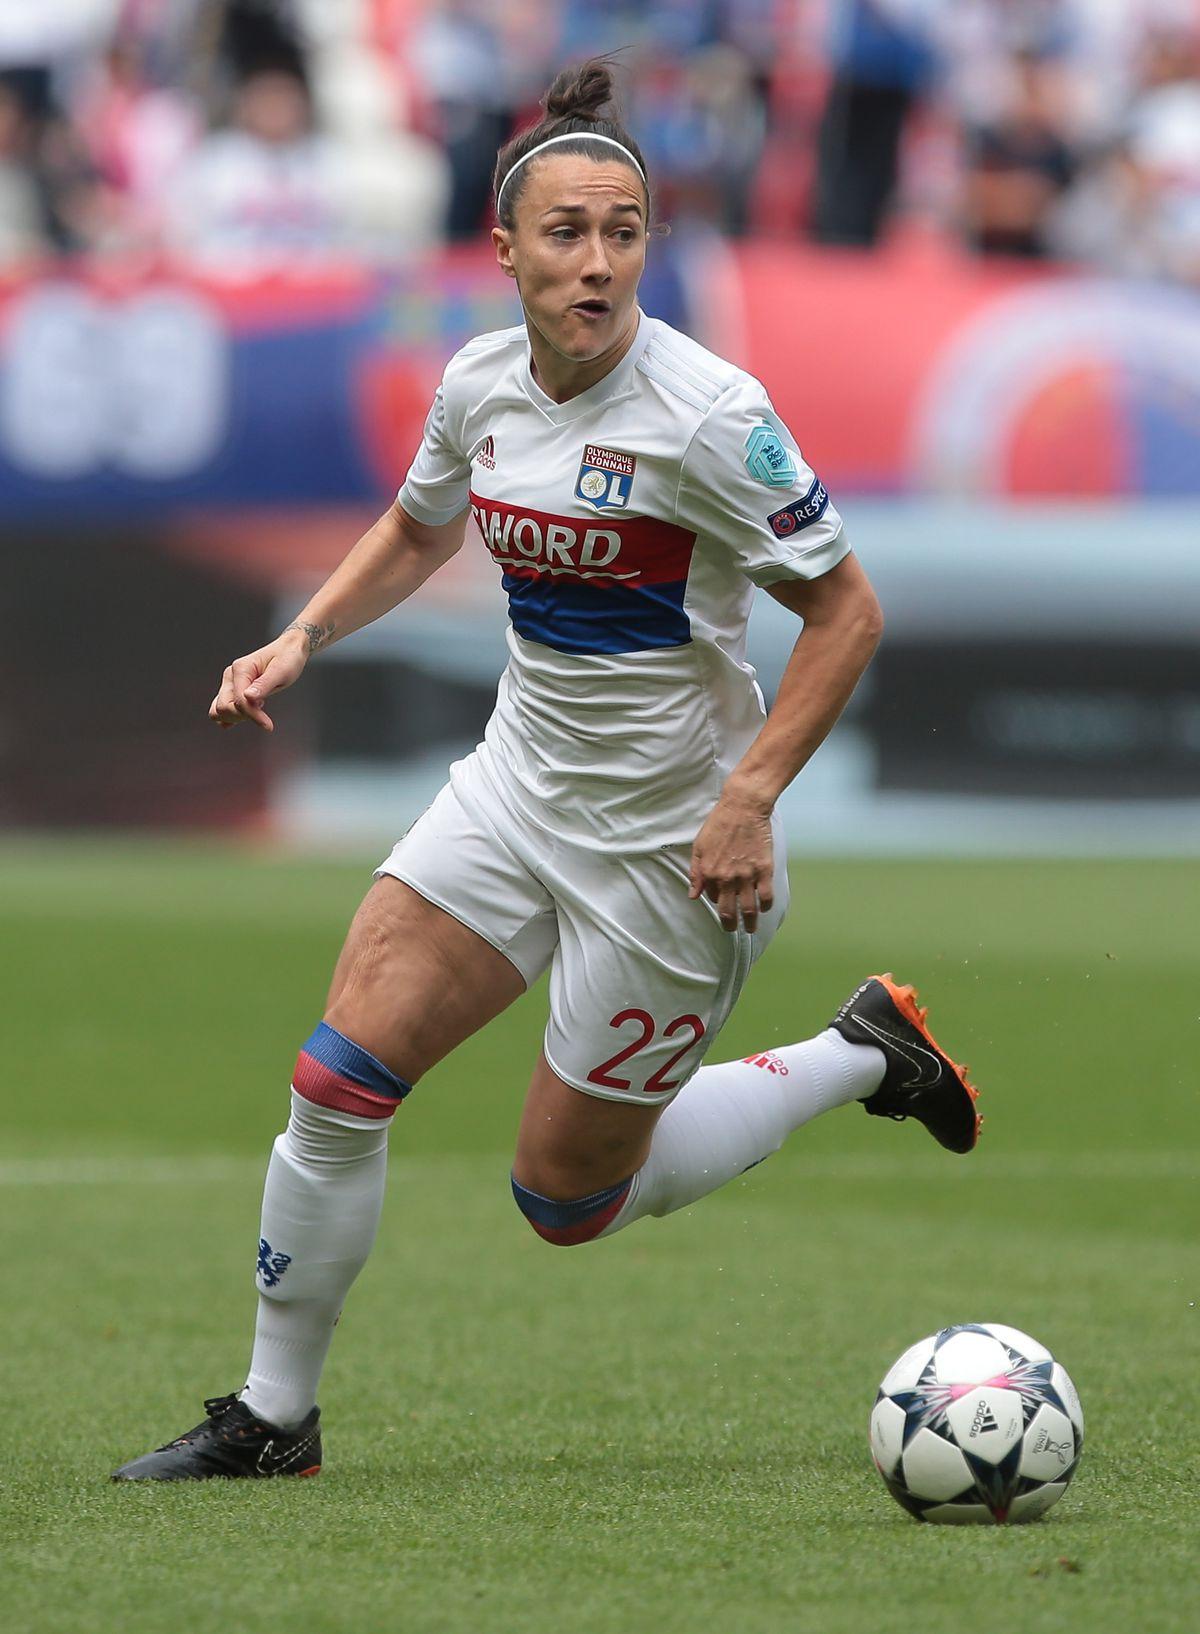 Olympique Lyon v Manchester City - Women's UEFA Champions League Semi Final Second Leg